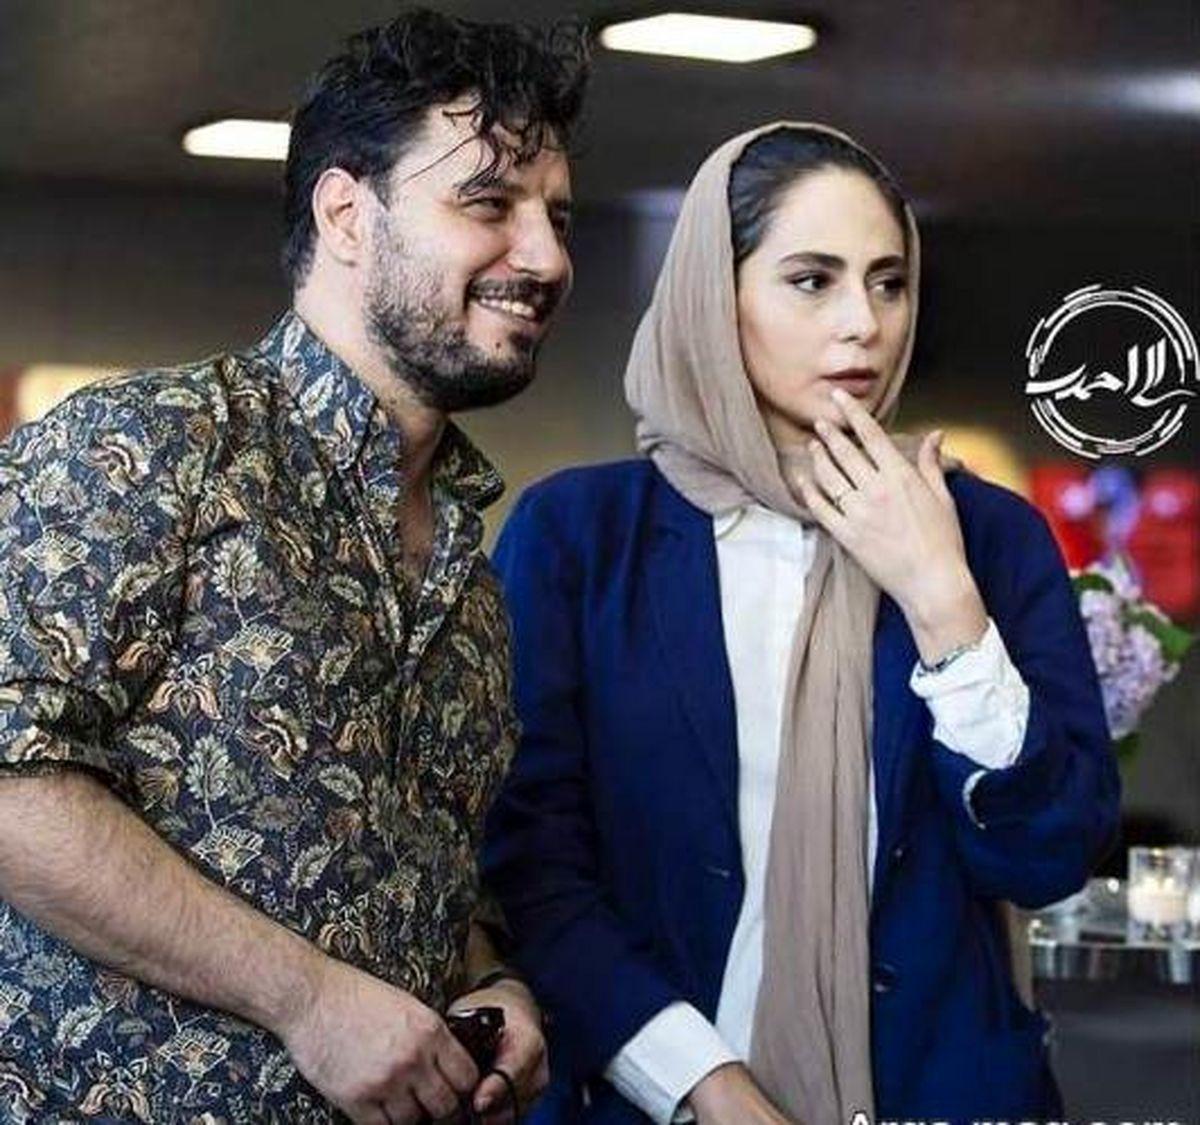 لاکچری بازی جواد عزتی و همسرش روی دریا! +تصاویر لورفته